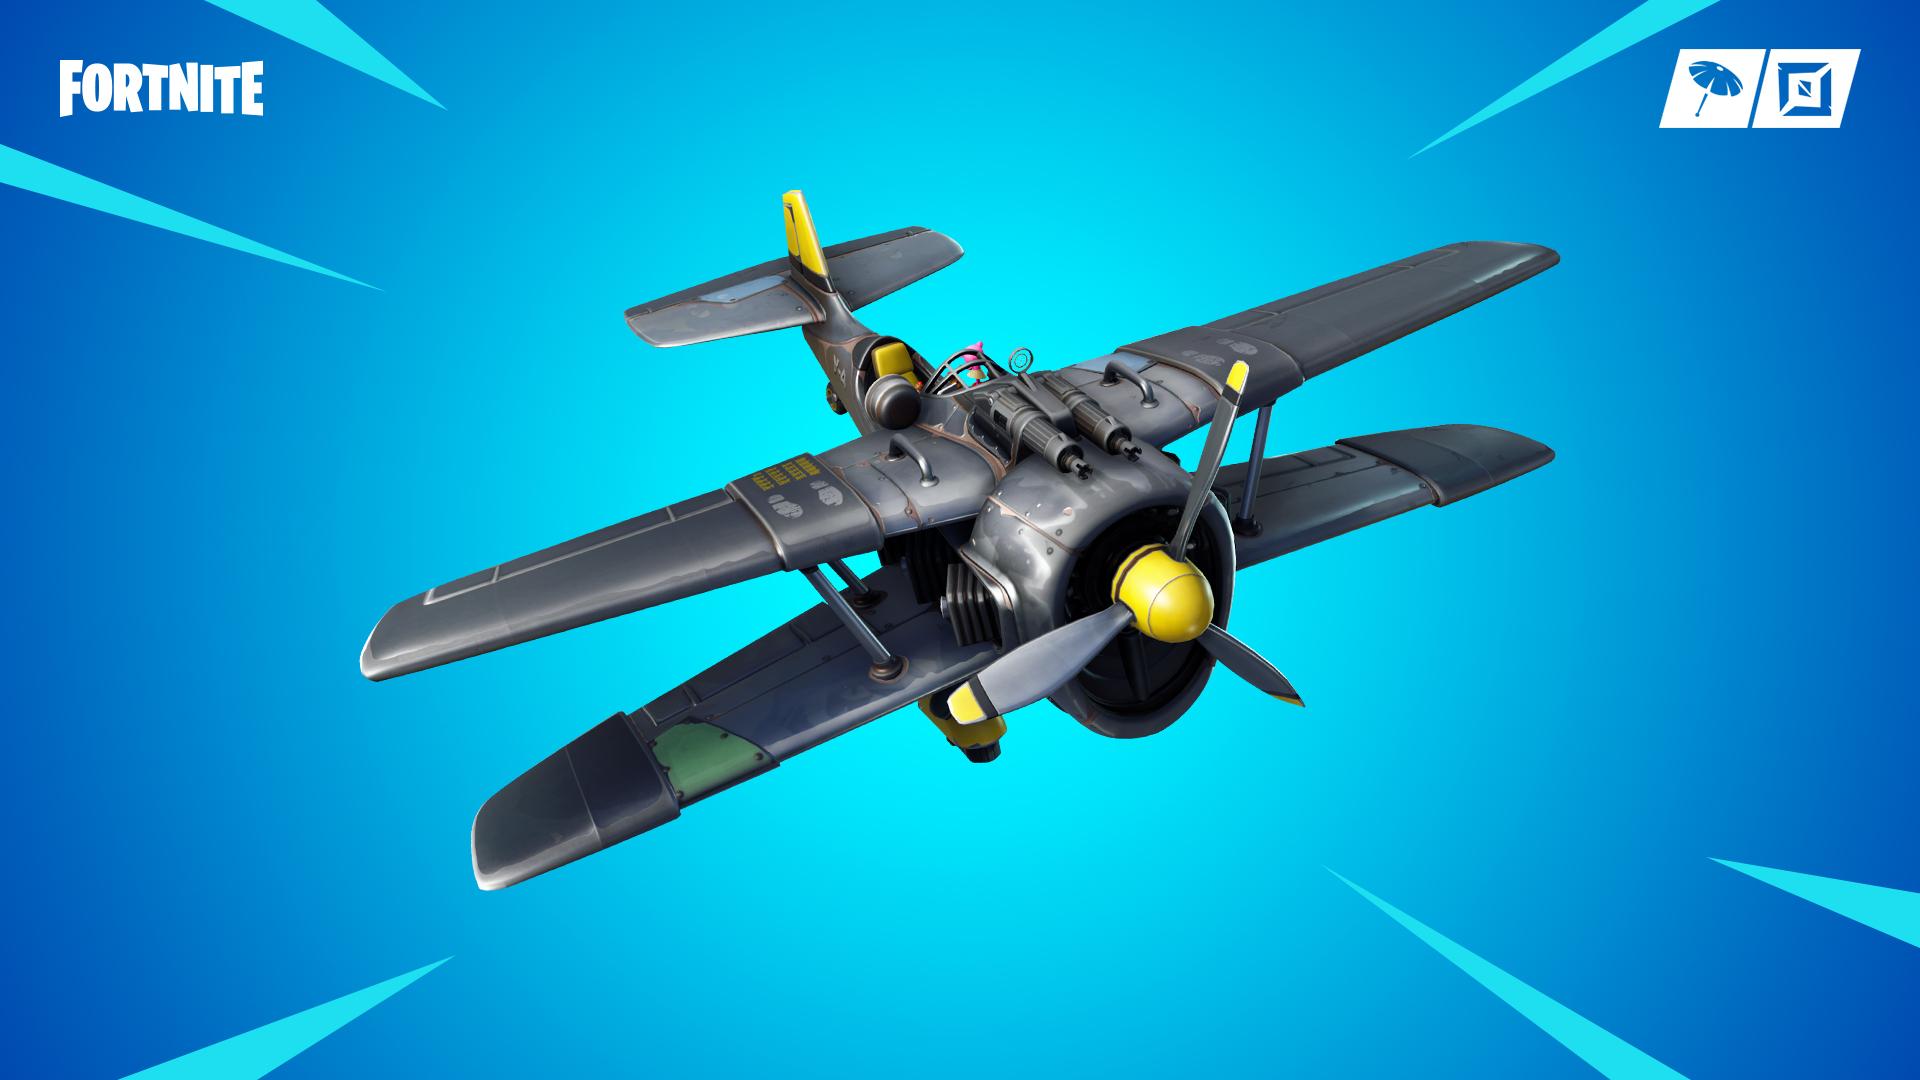 Fortnite Season 7 Brings Stormwing Plane Wraps And More